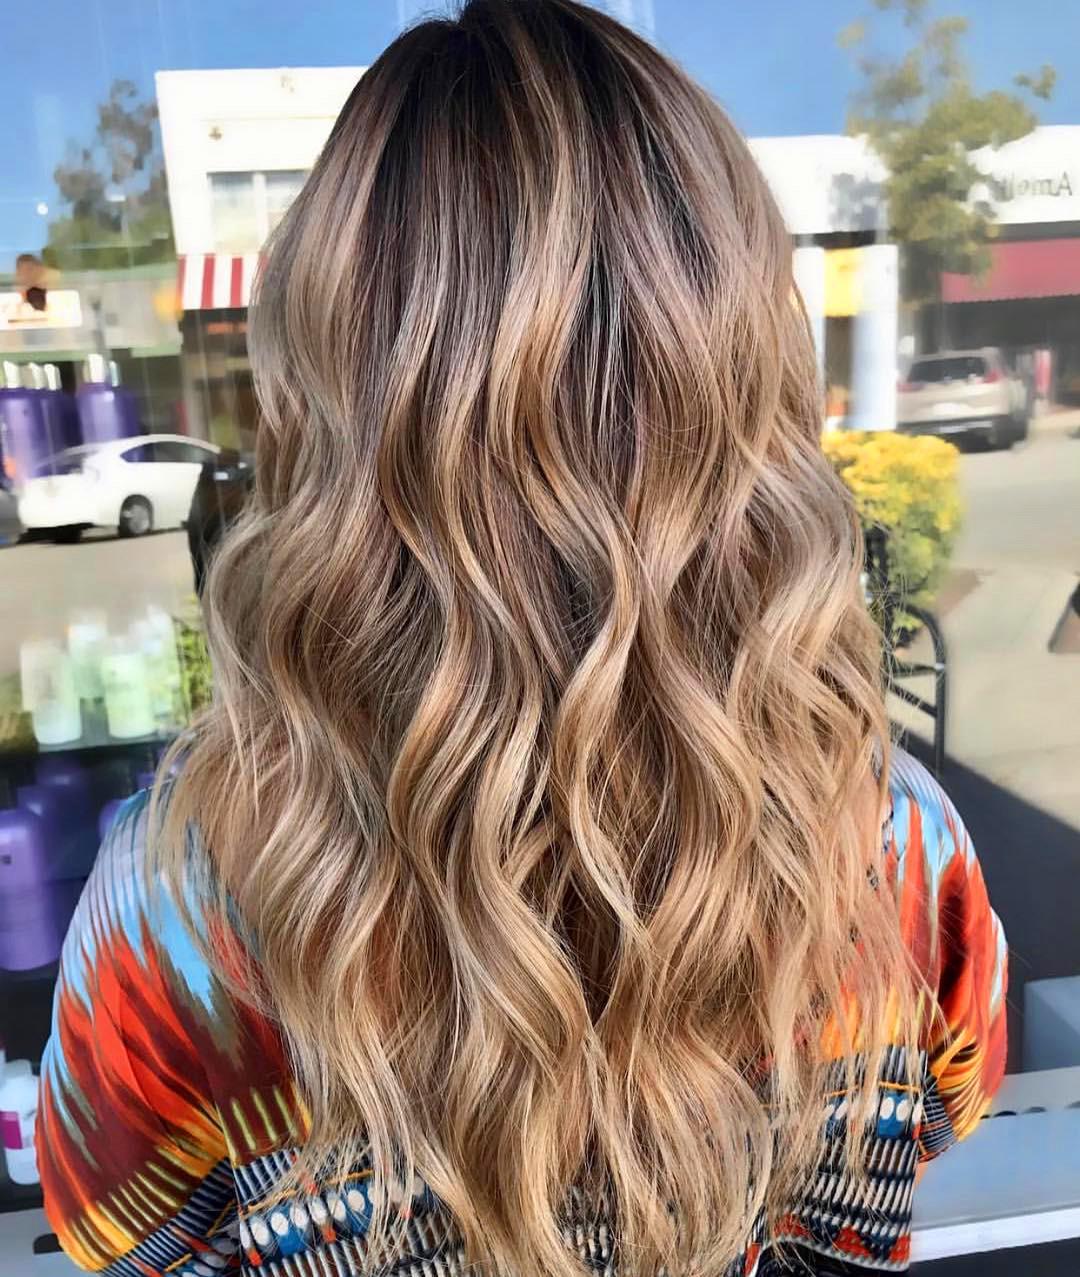 65 Flattering Medium Hairstyles for Women